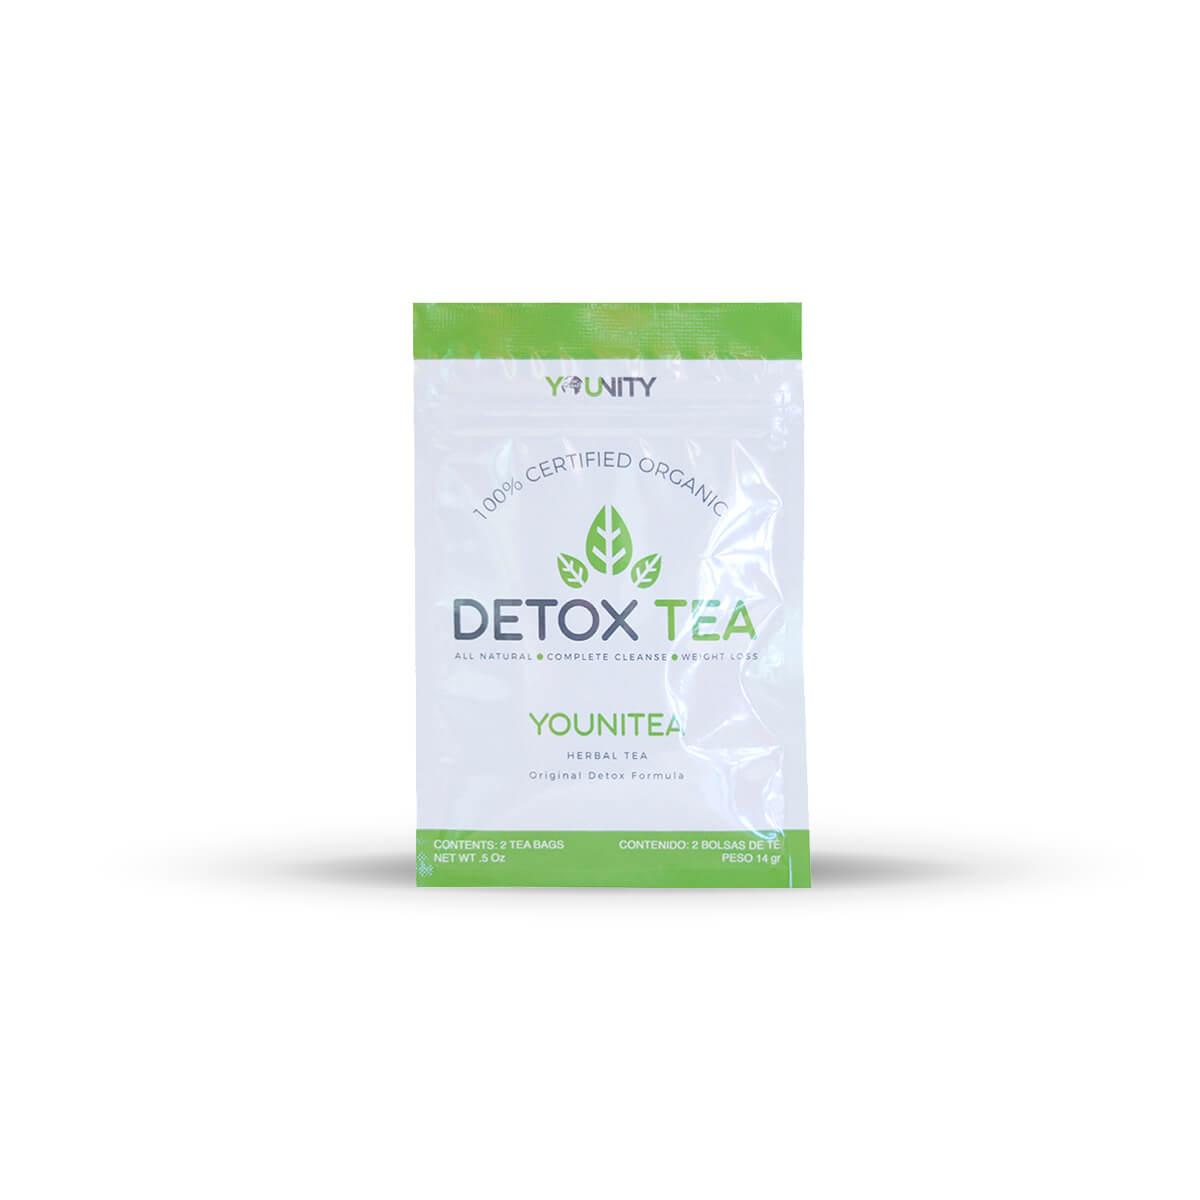 detox-product